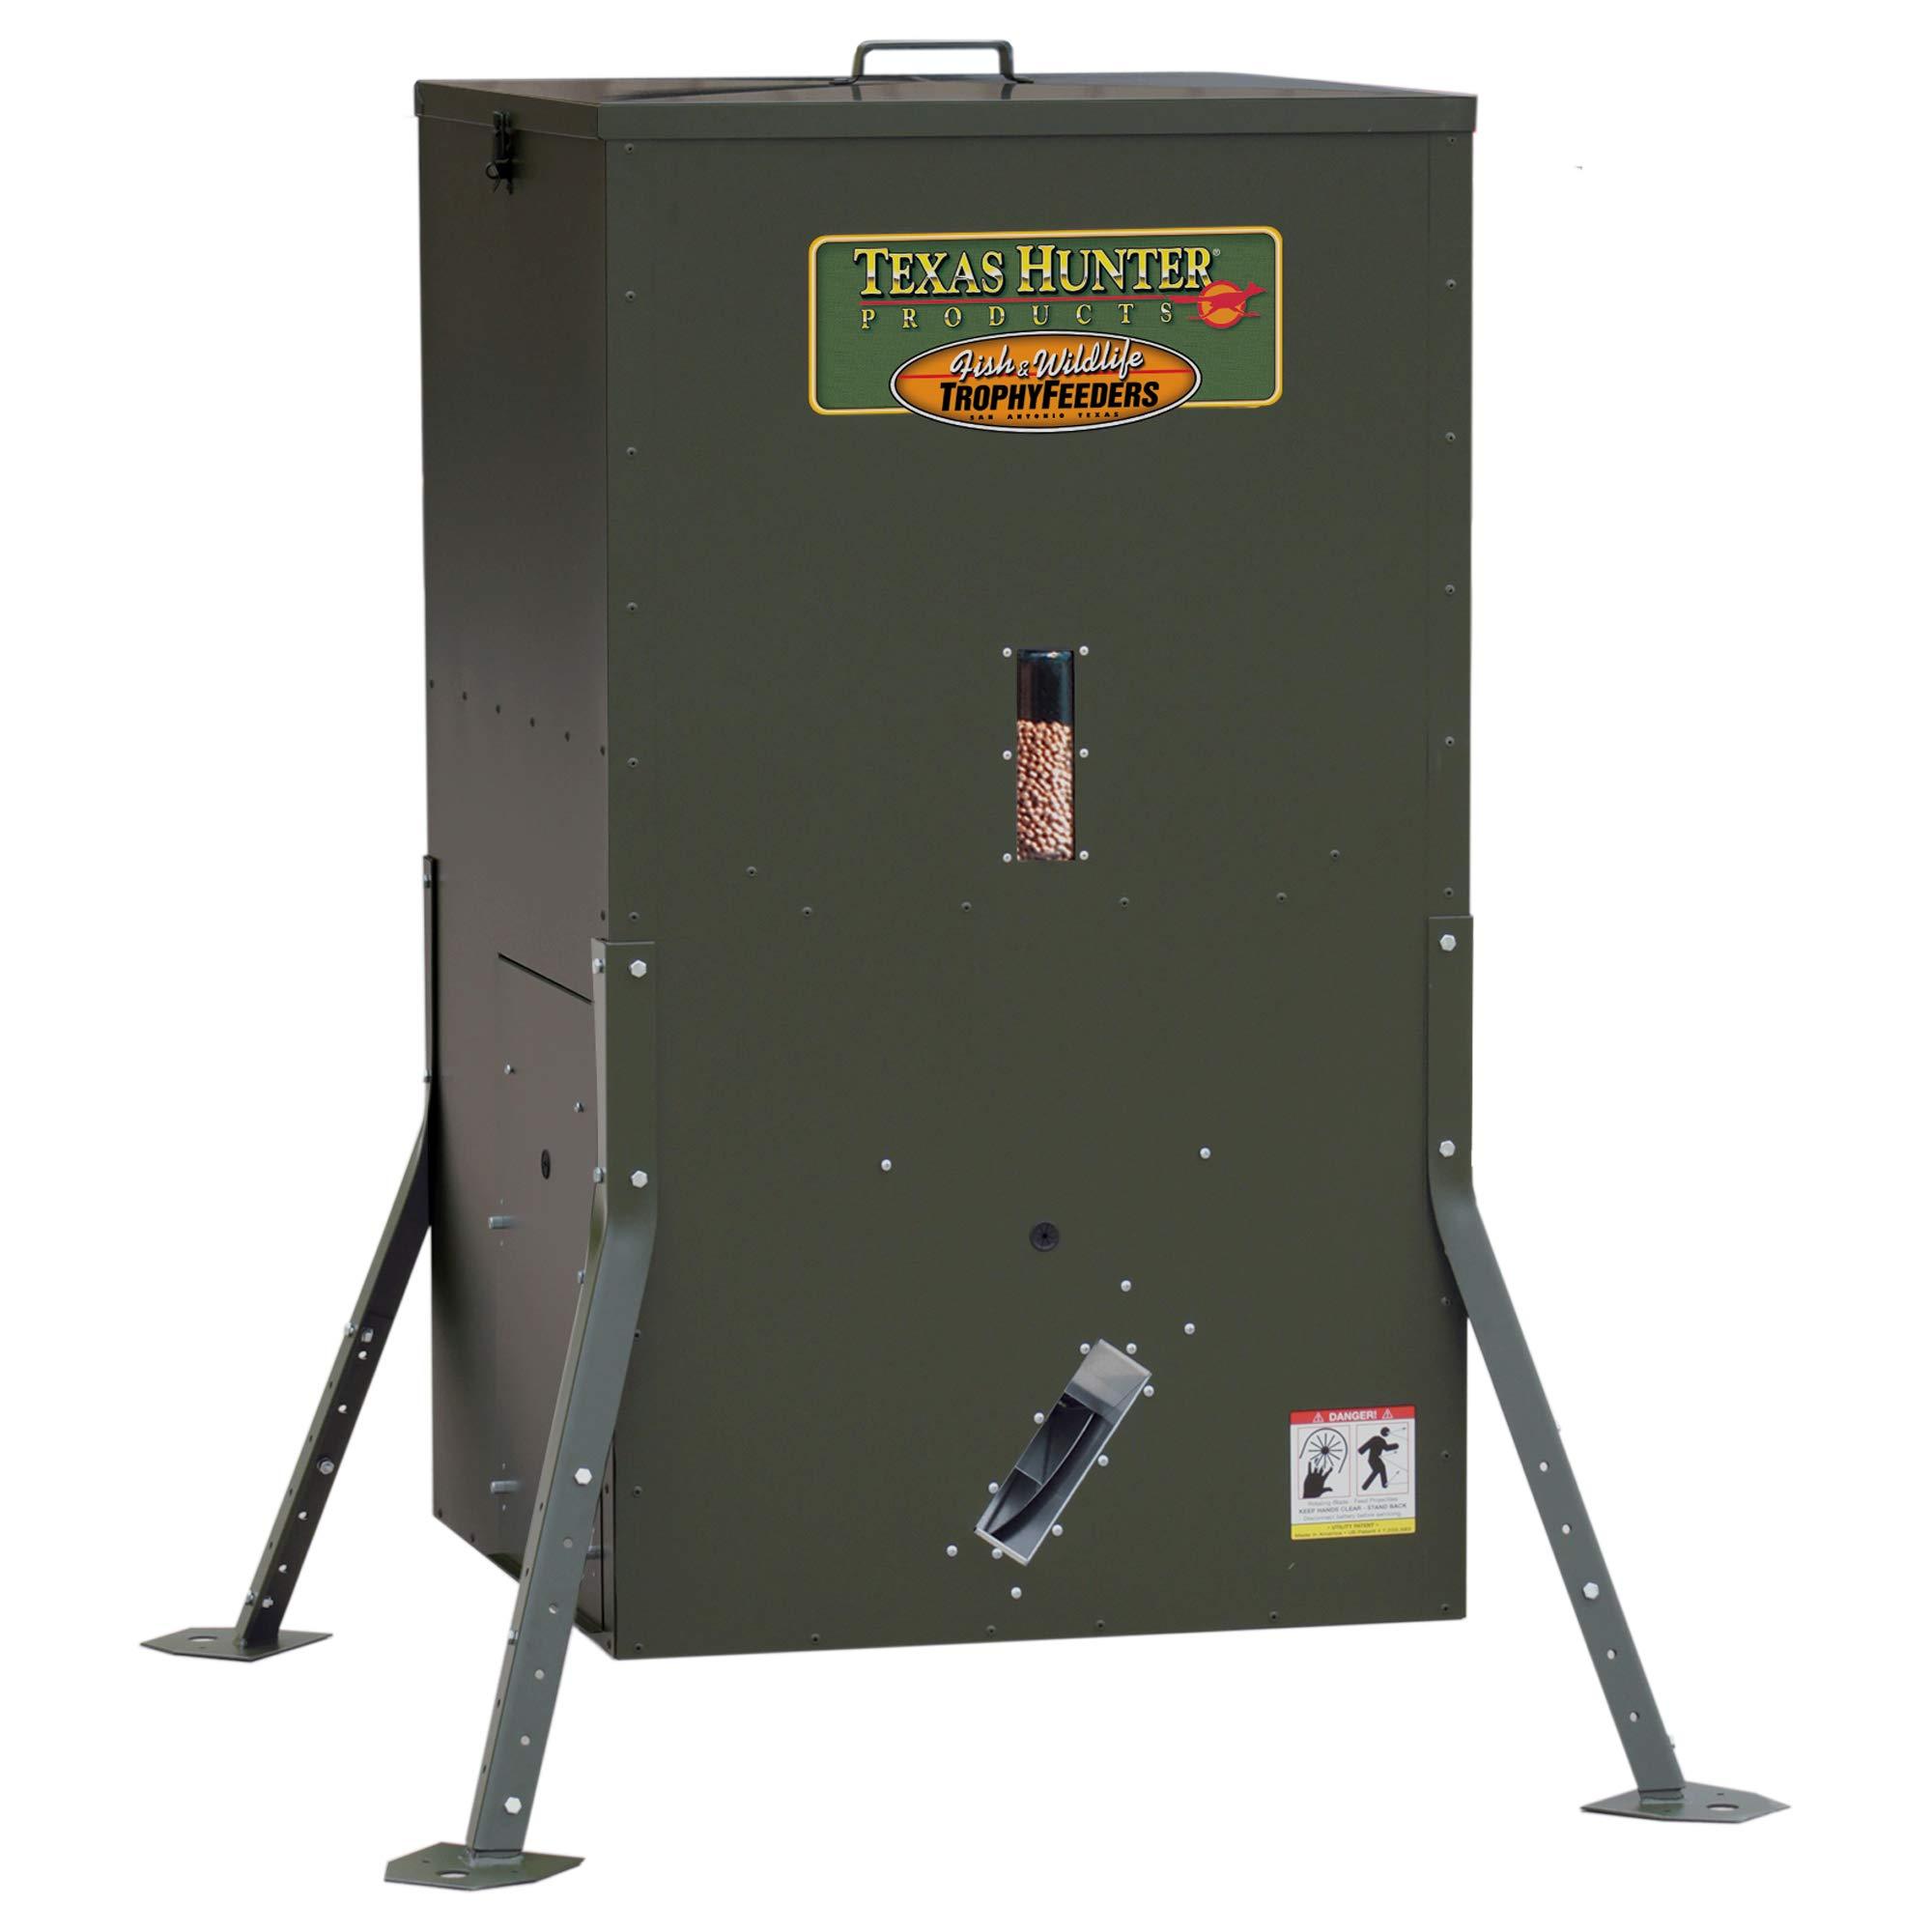 Texas Hunter Directional Fish Feeder w/Adjustable Legs - 175 lb. Fish Feed Capacity - Model DF300AL